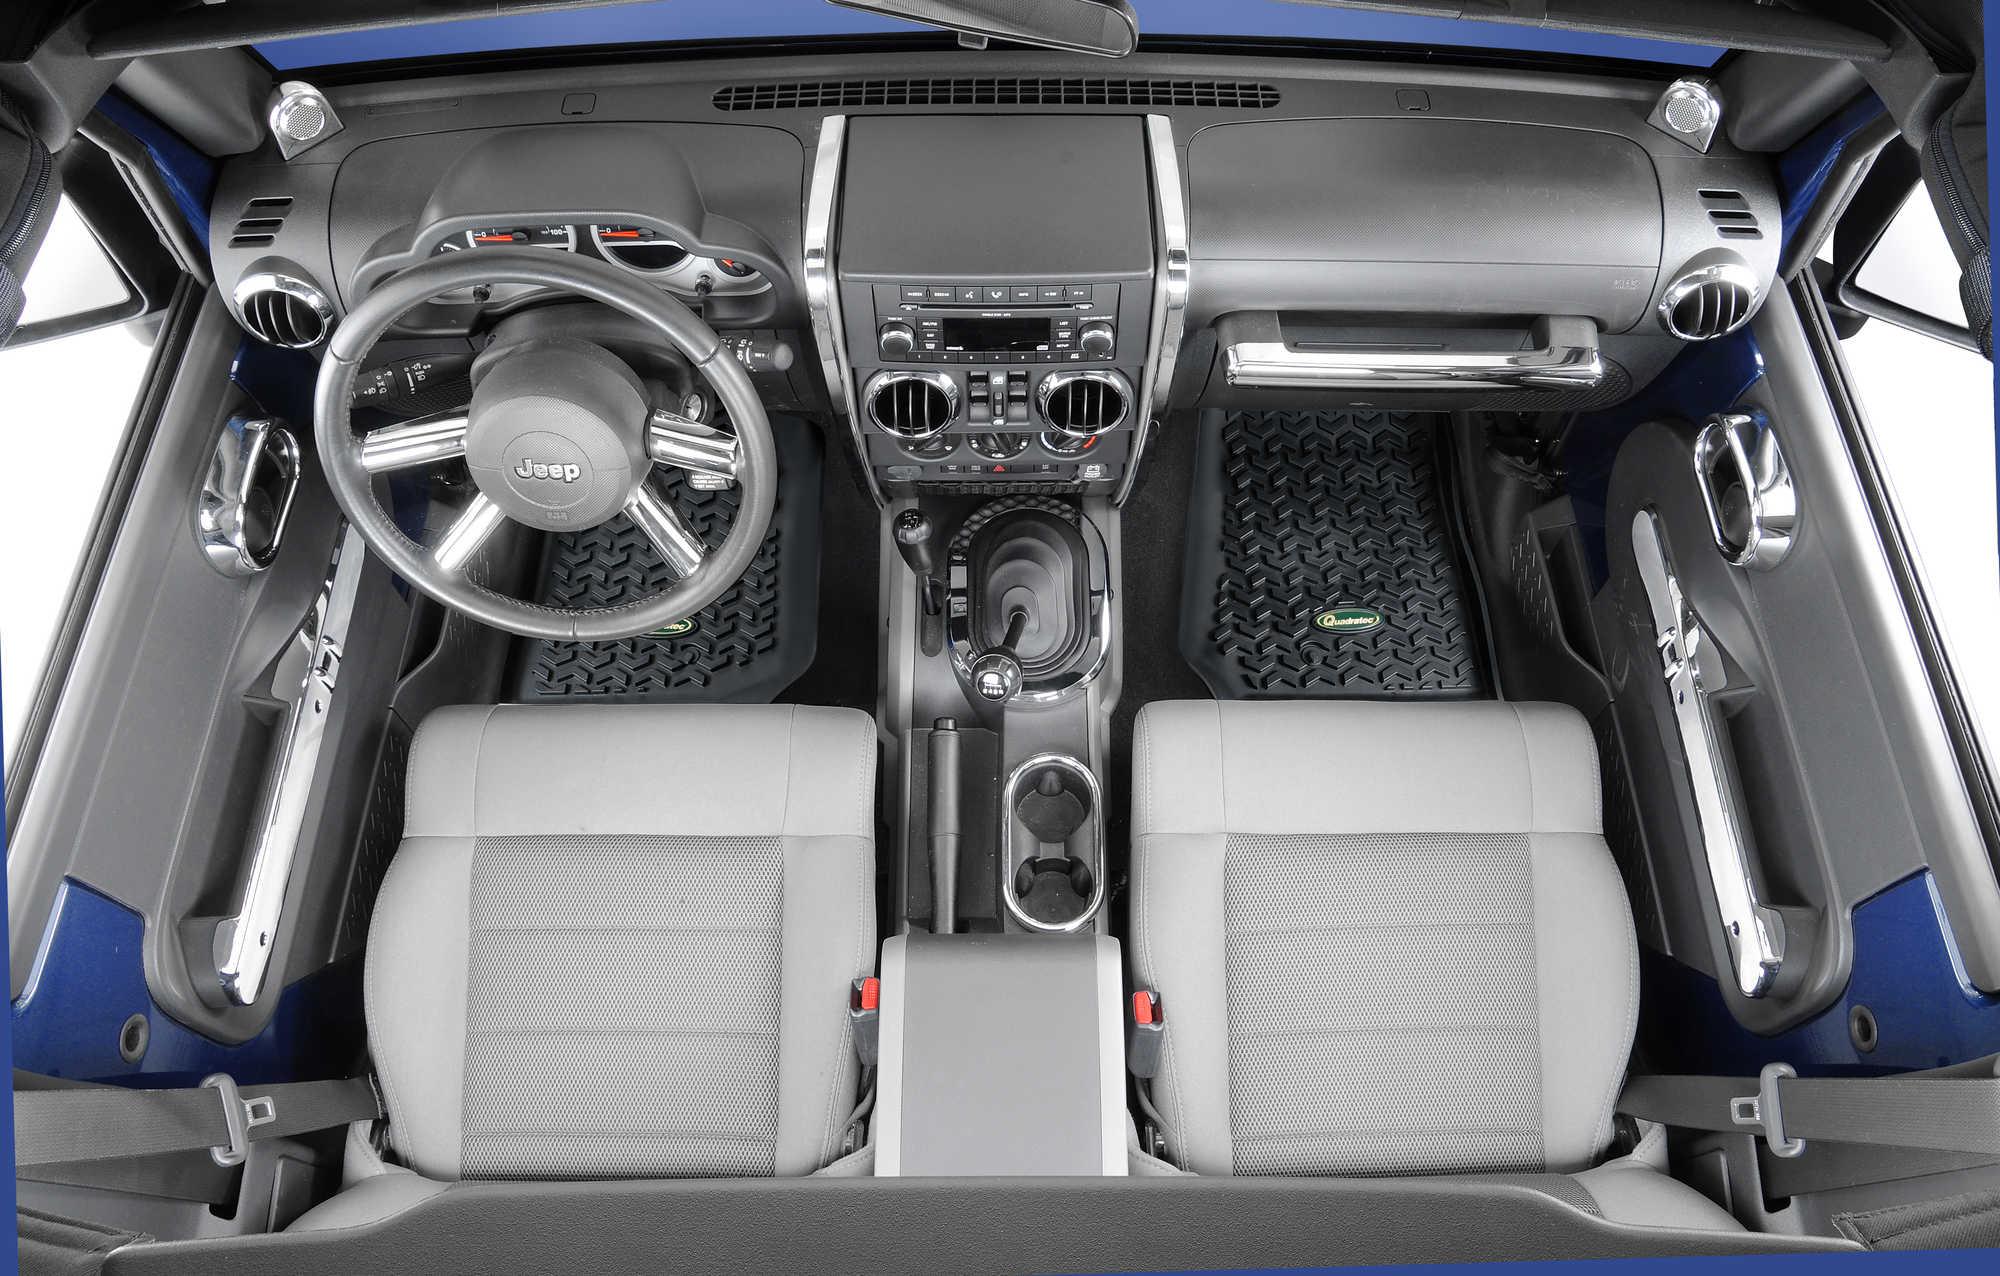 jk hemi conversion manual transmission